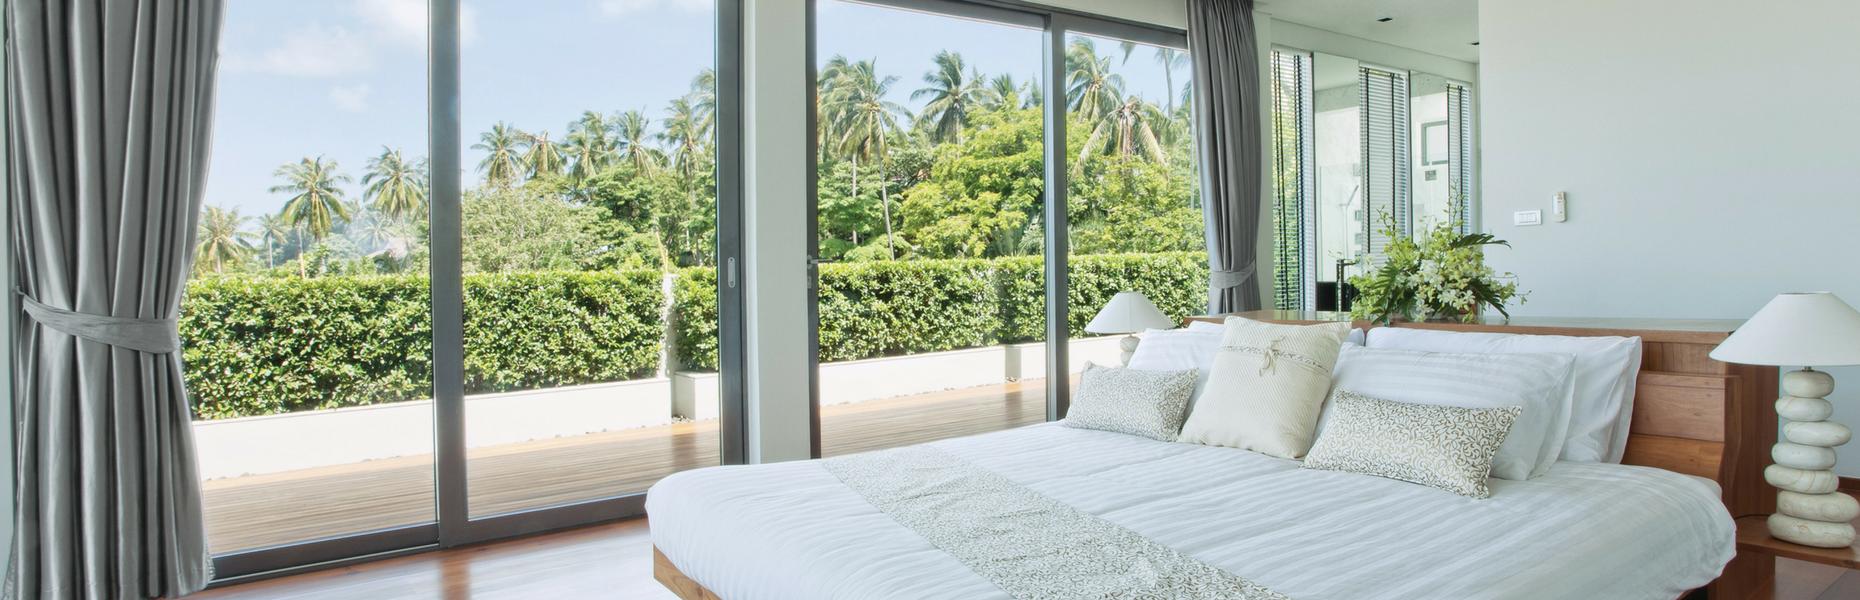 Bedroom Design Ideas Nature